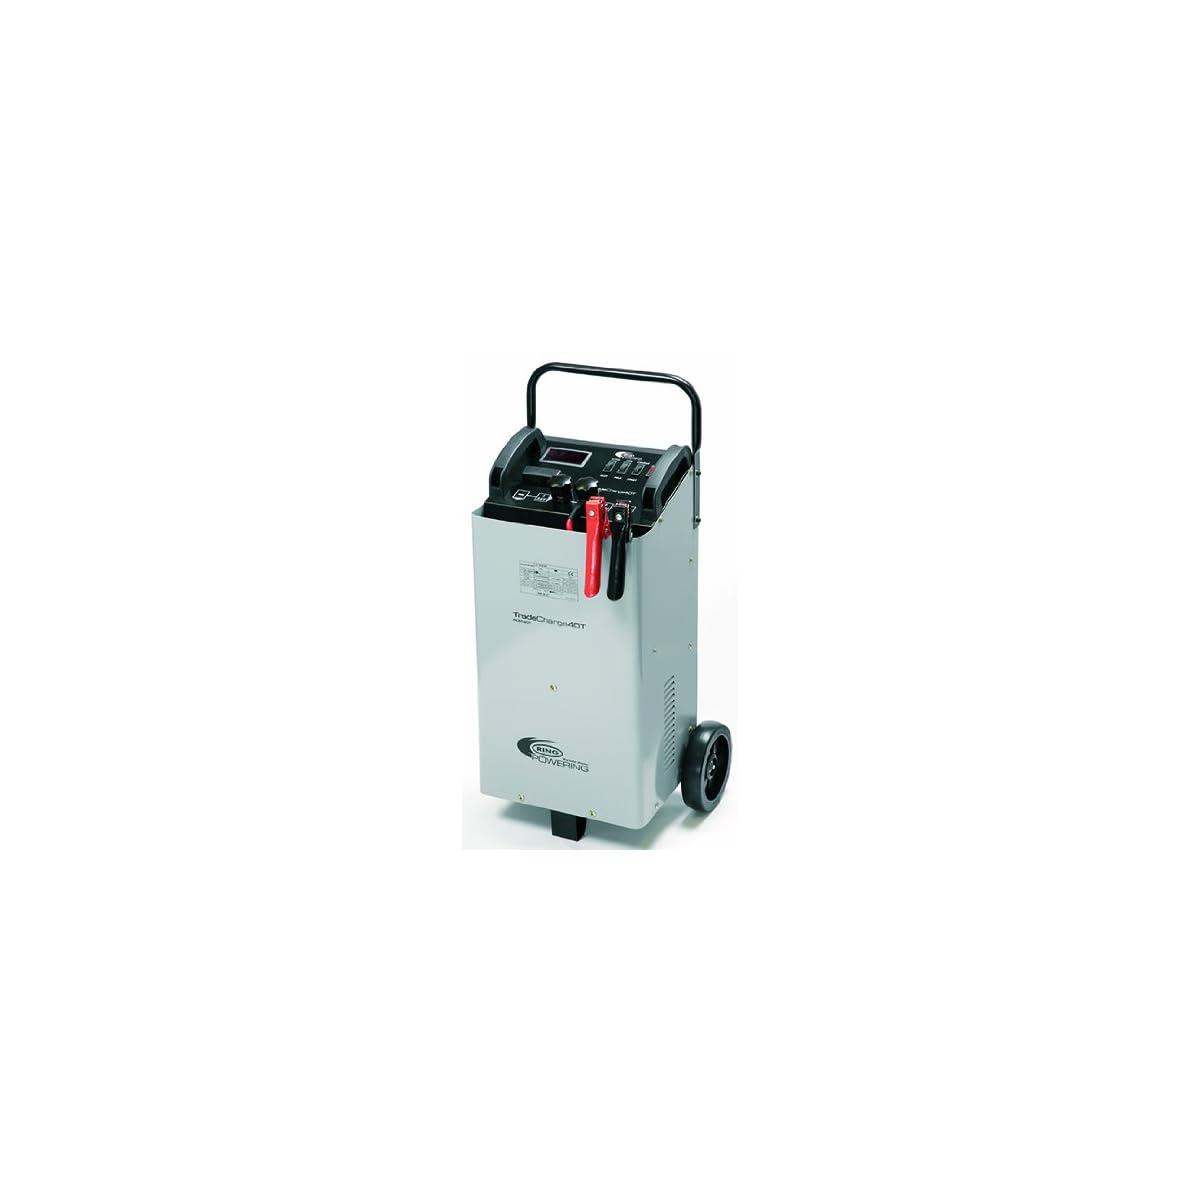 411DxcZK3hL. SS1200  - Ring RCBT40T Cargador de batería para vehículos - Cargadores de baterías para vehículos